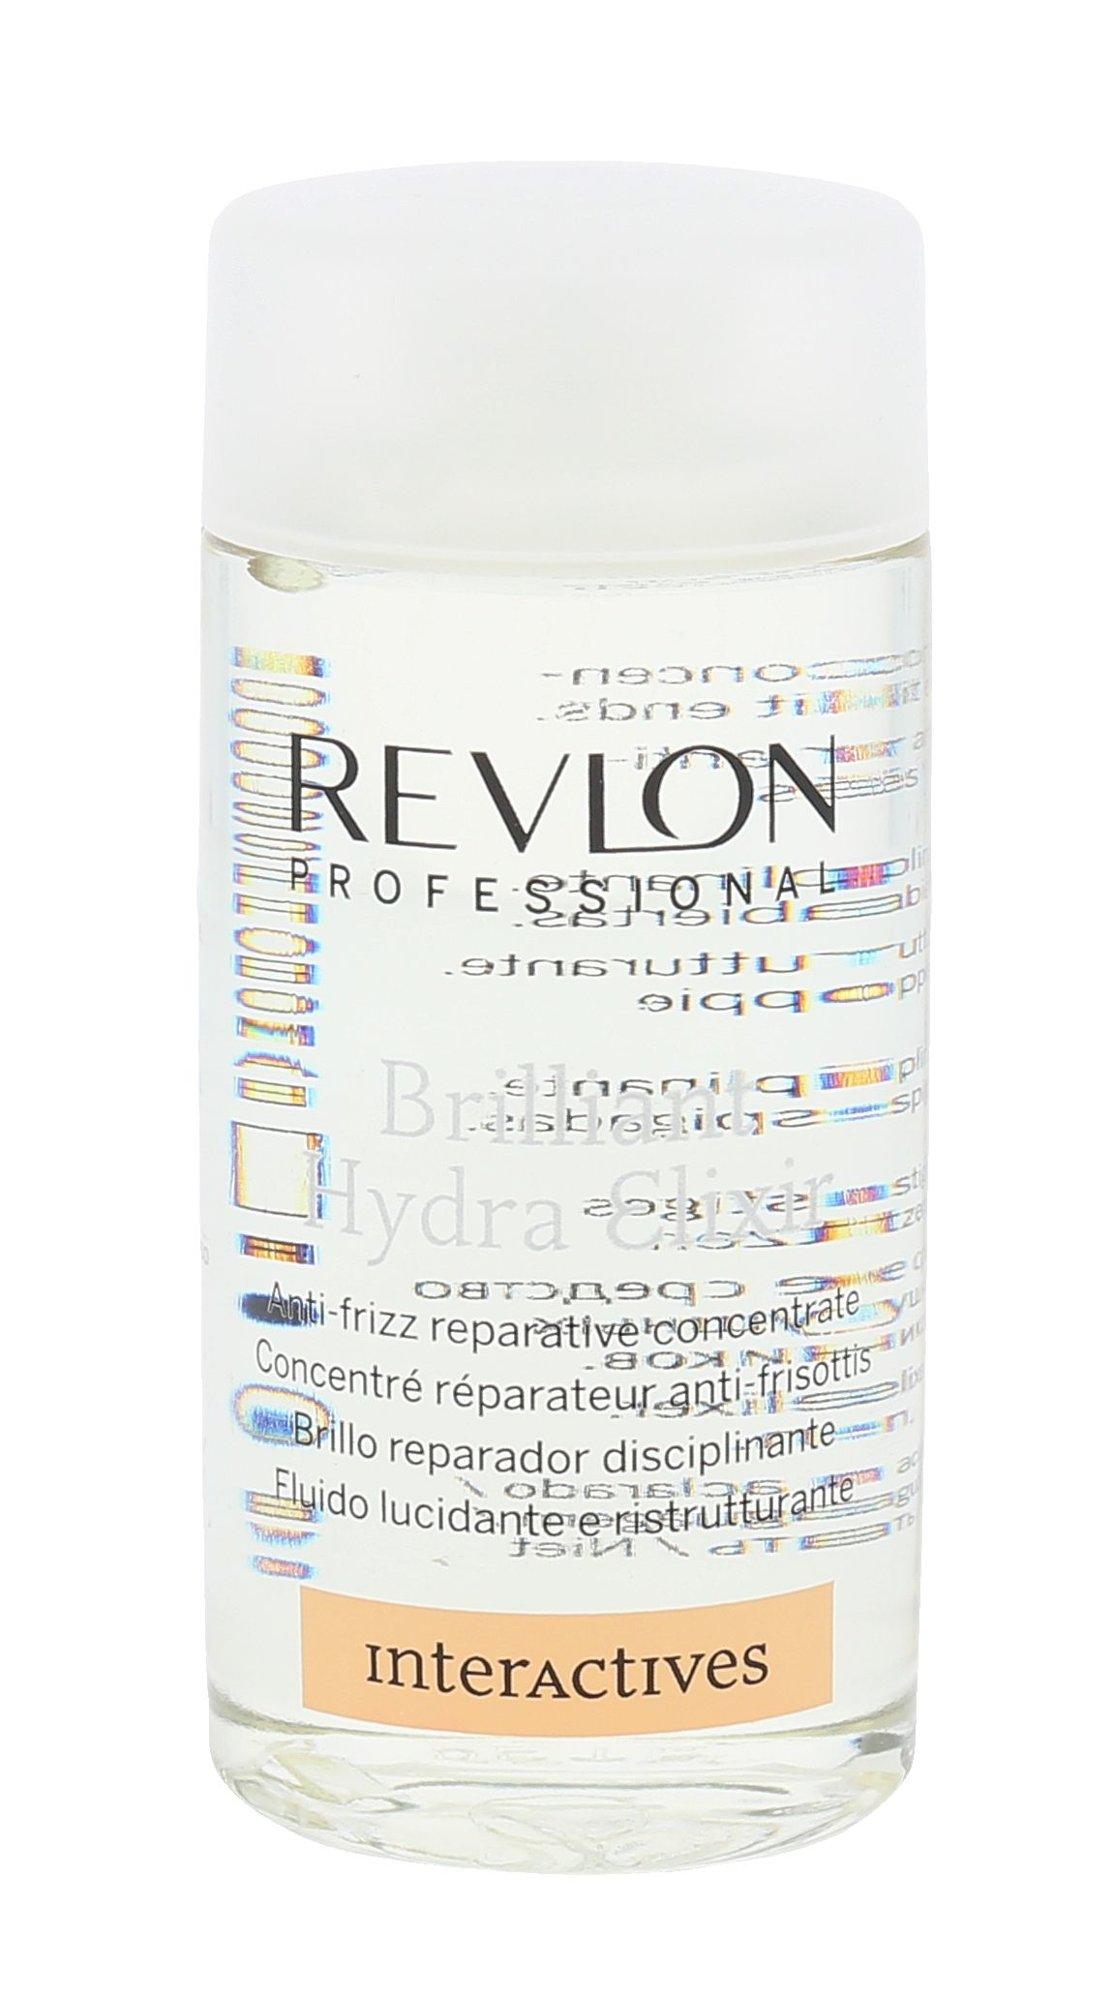 Revlon Professional Interactives Cosmetic 125ml